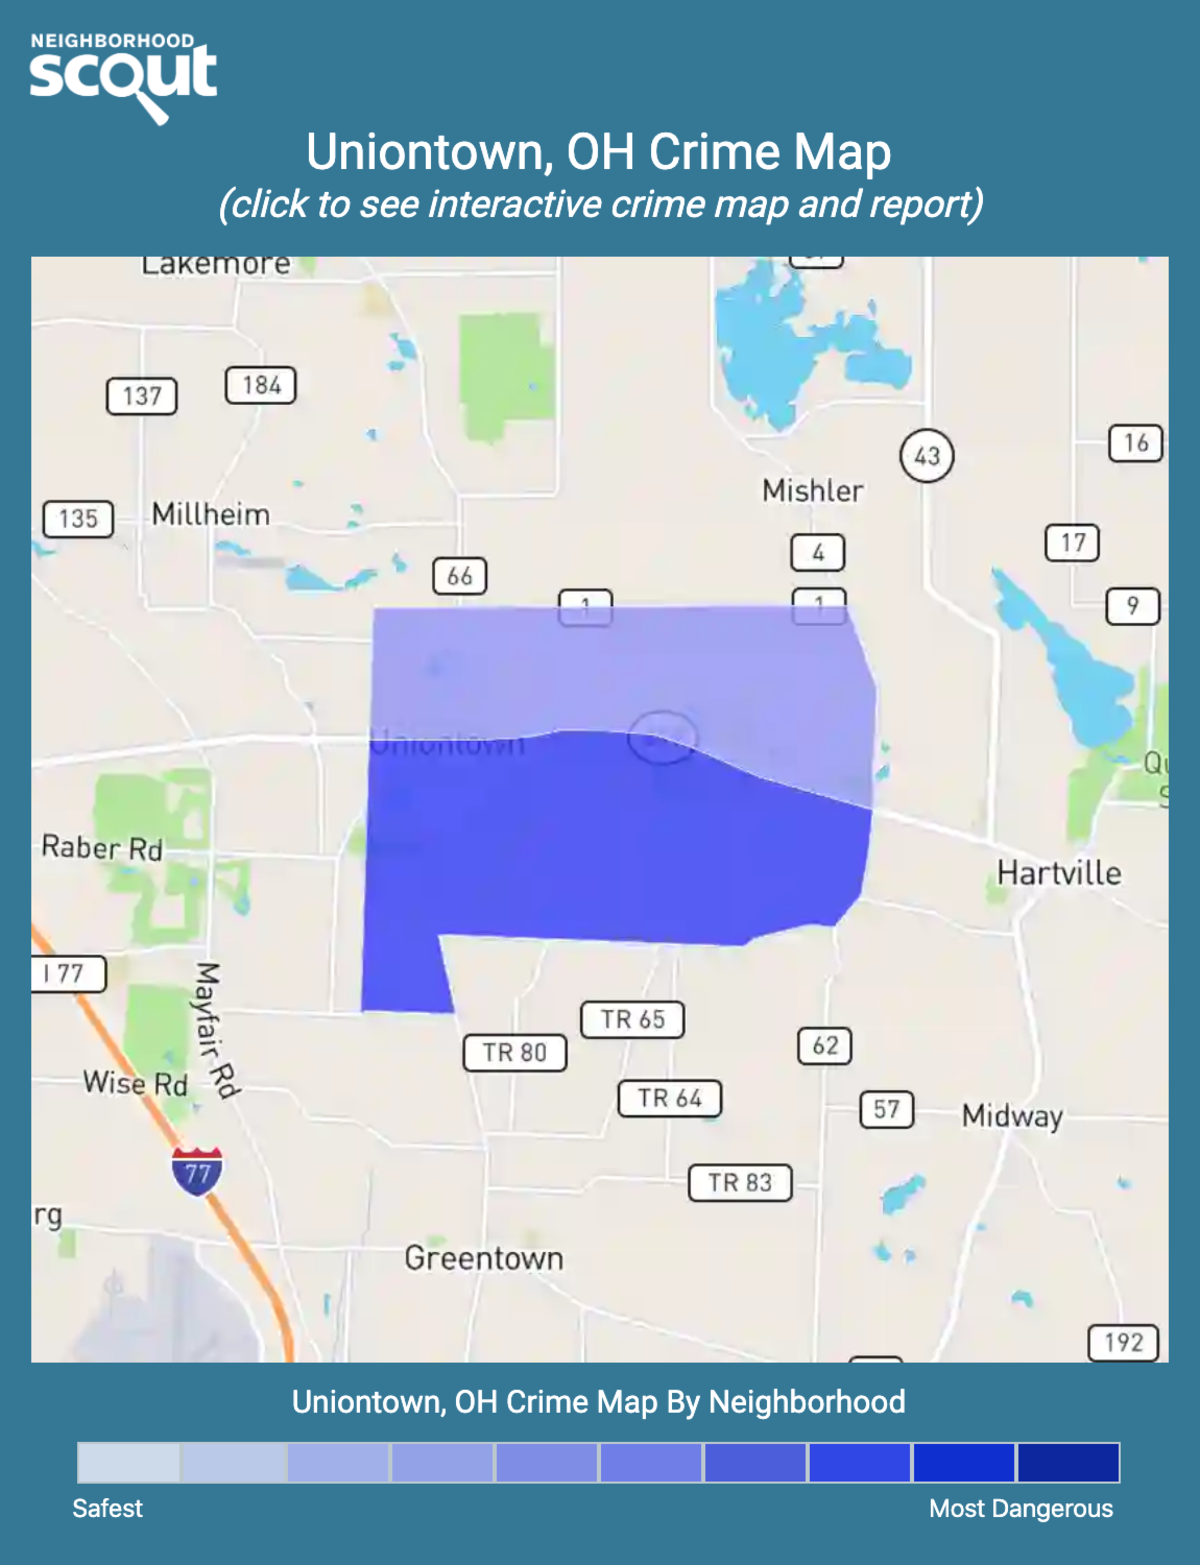 Uniontown, Ohio crime map